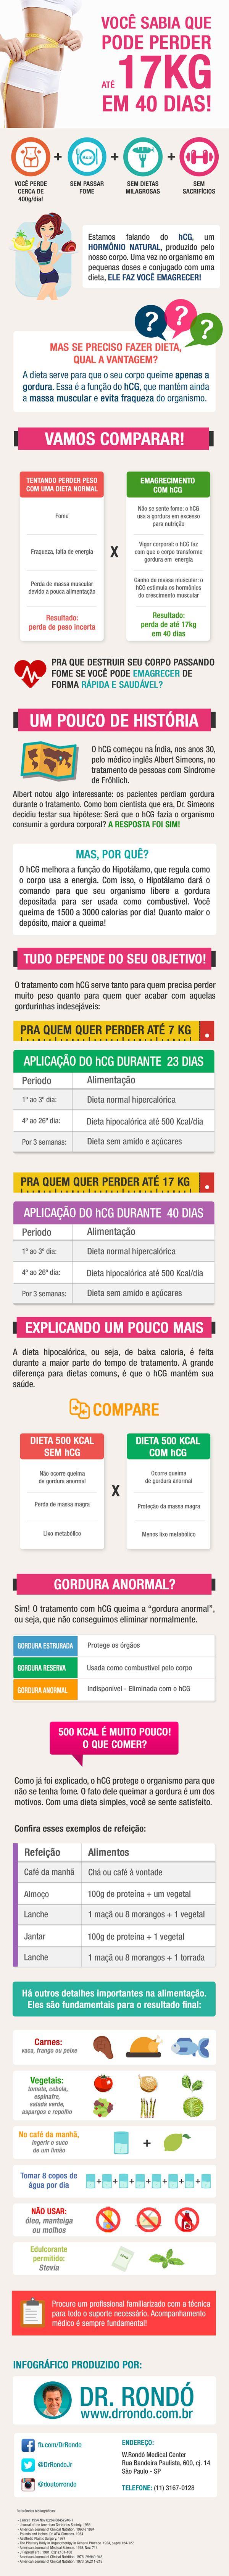 dieta para perder peso hcg